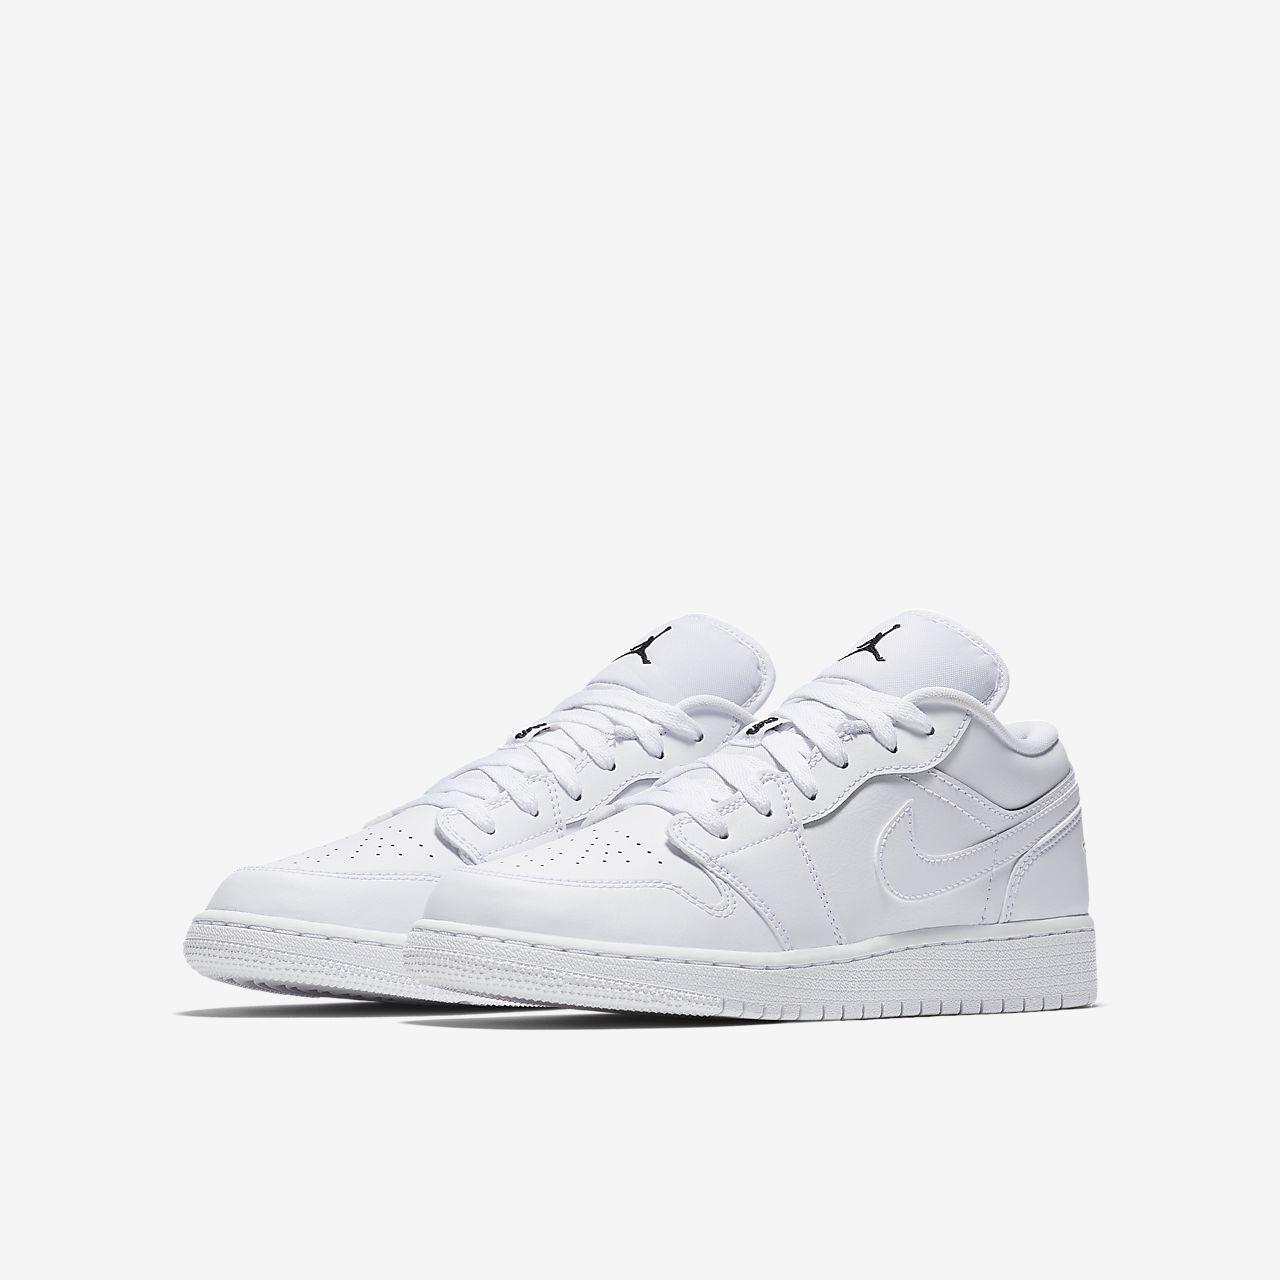 the latest 312ea f0f52 ... Air Jordan 1 Low Older Kids  Shoe